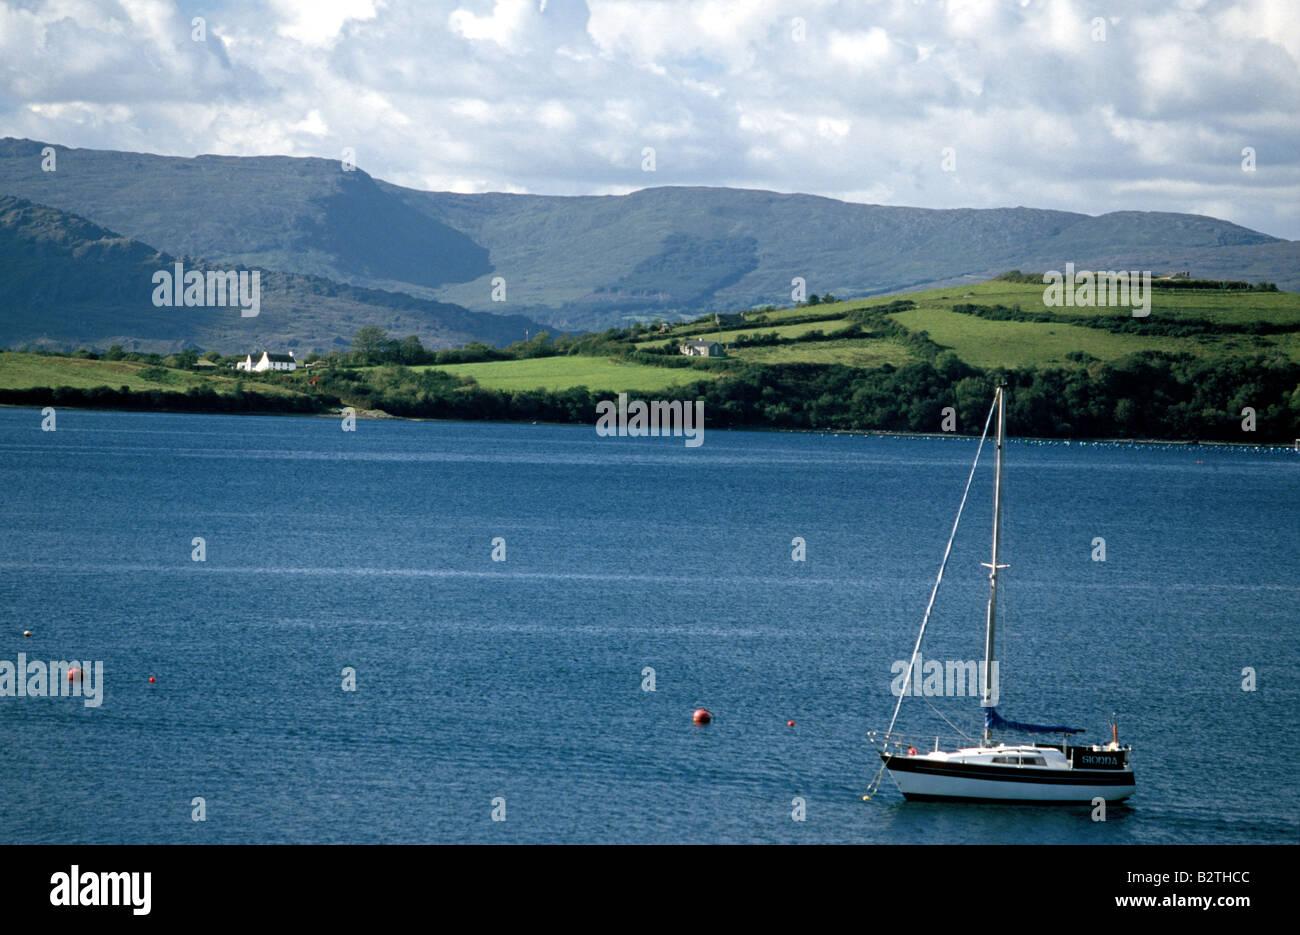 Sailboat on Bantry Bay, County West Cork, Ireland - Stock Image